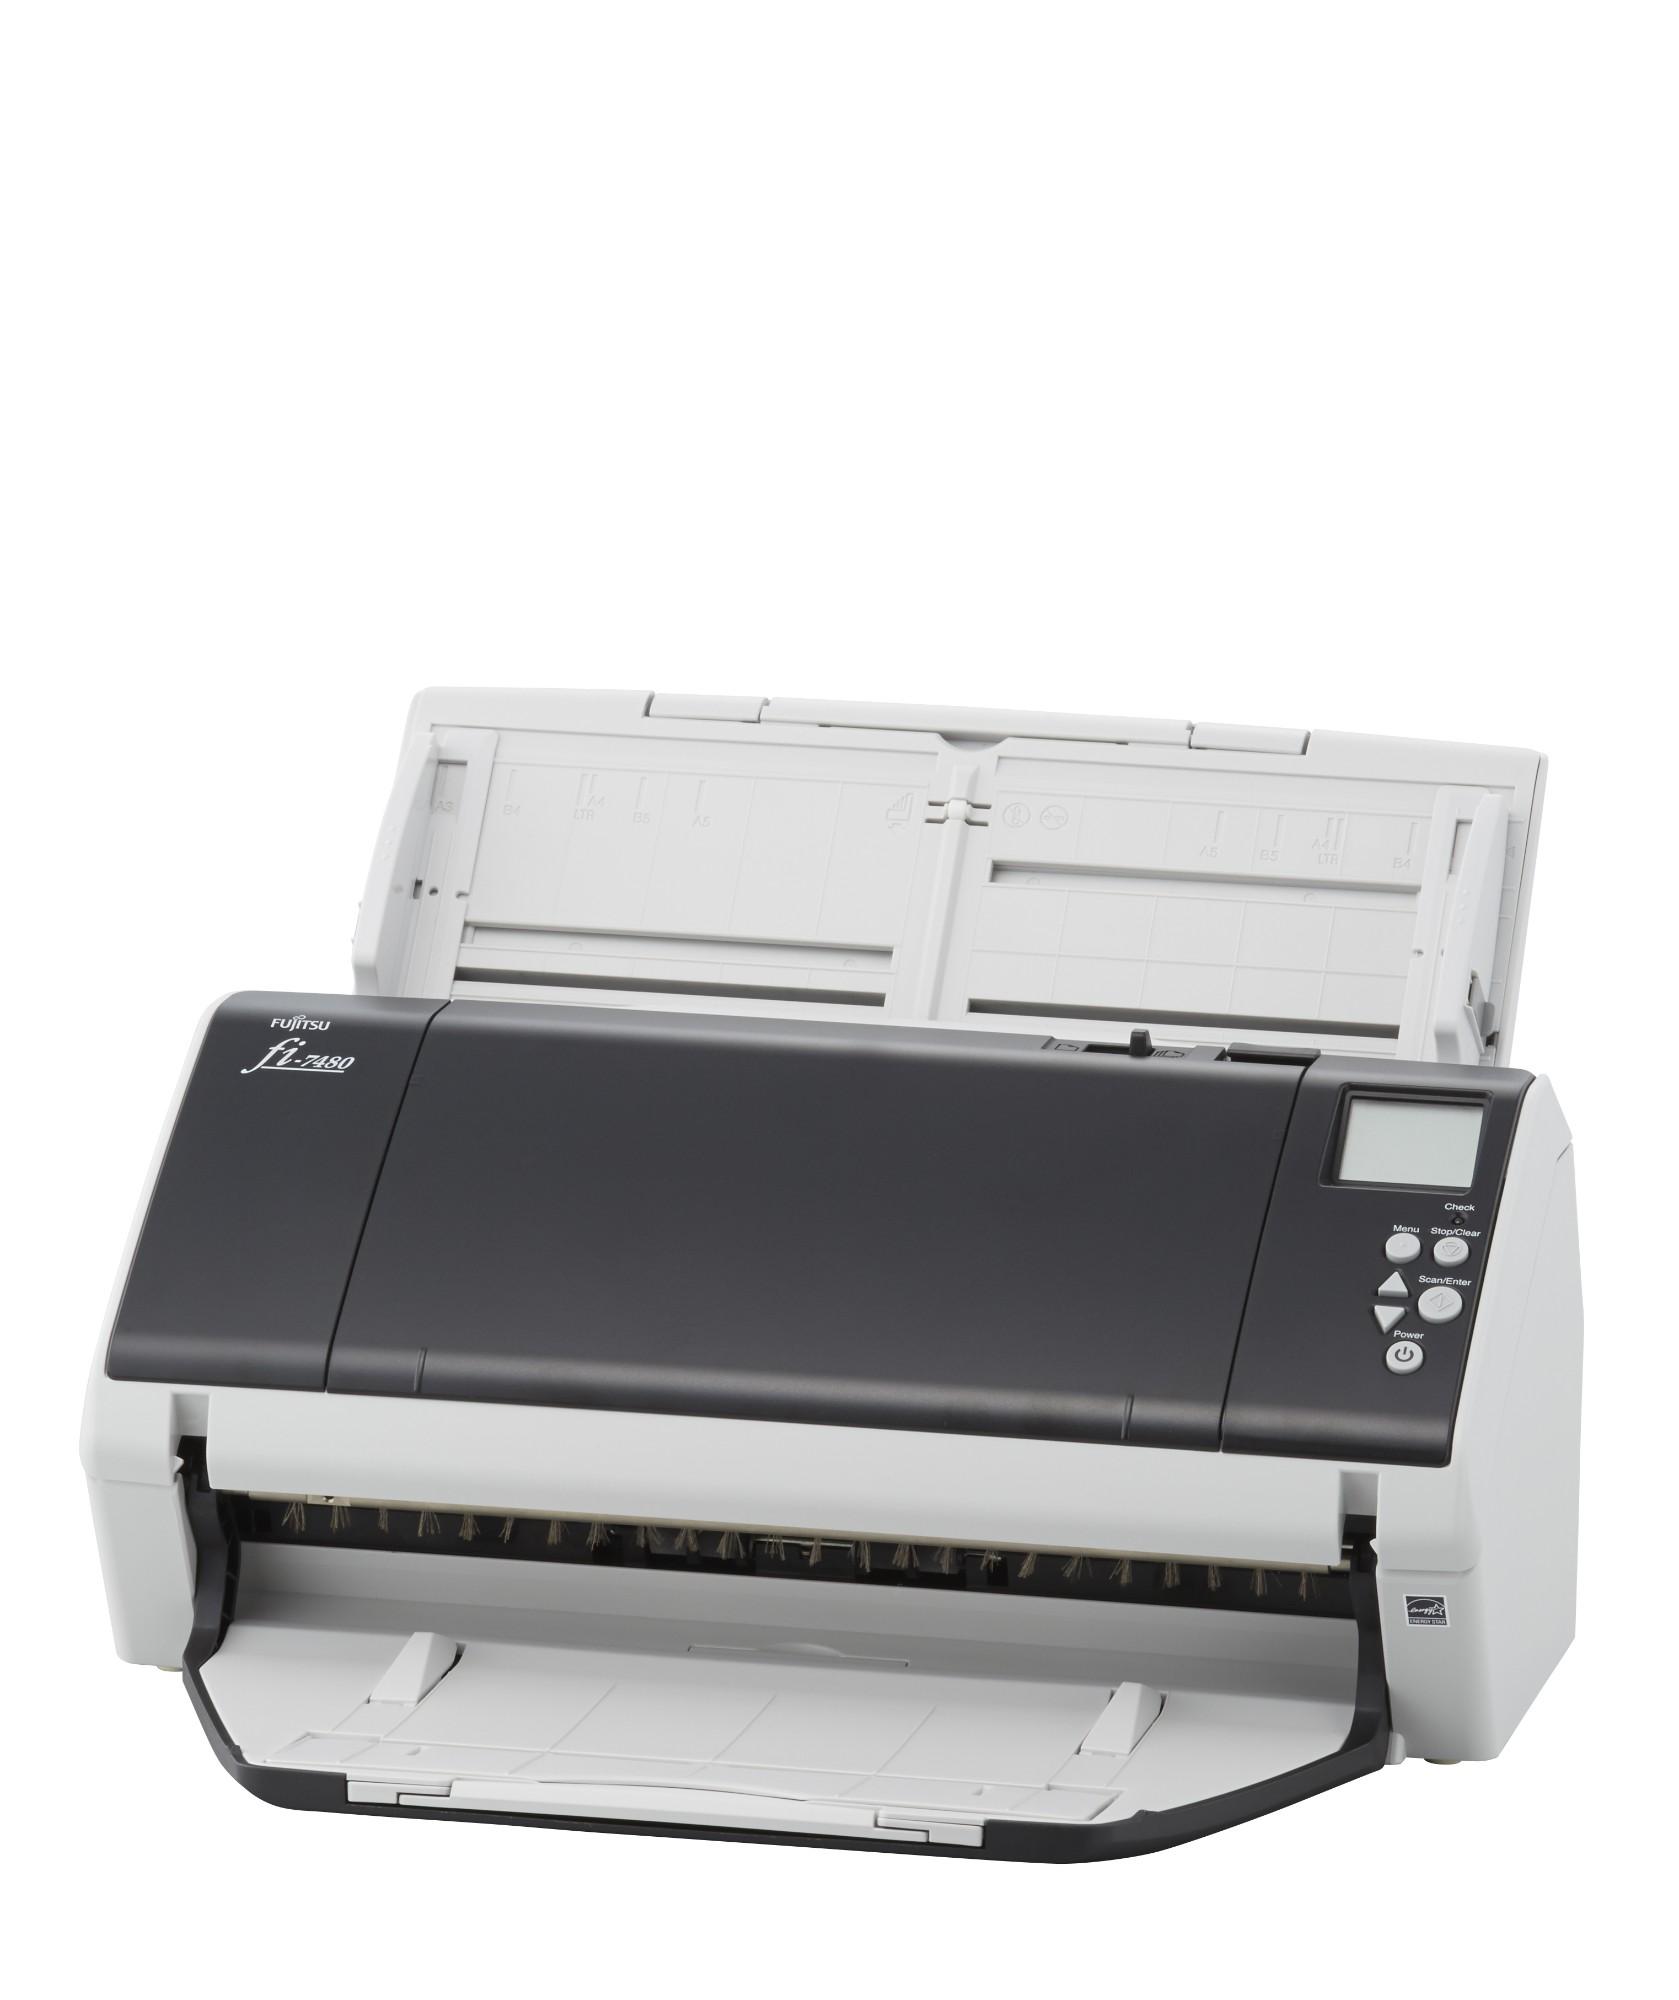 Fujitsu fi-7480 600 x 600 DPI ADF scanner Grey,White A3